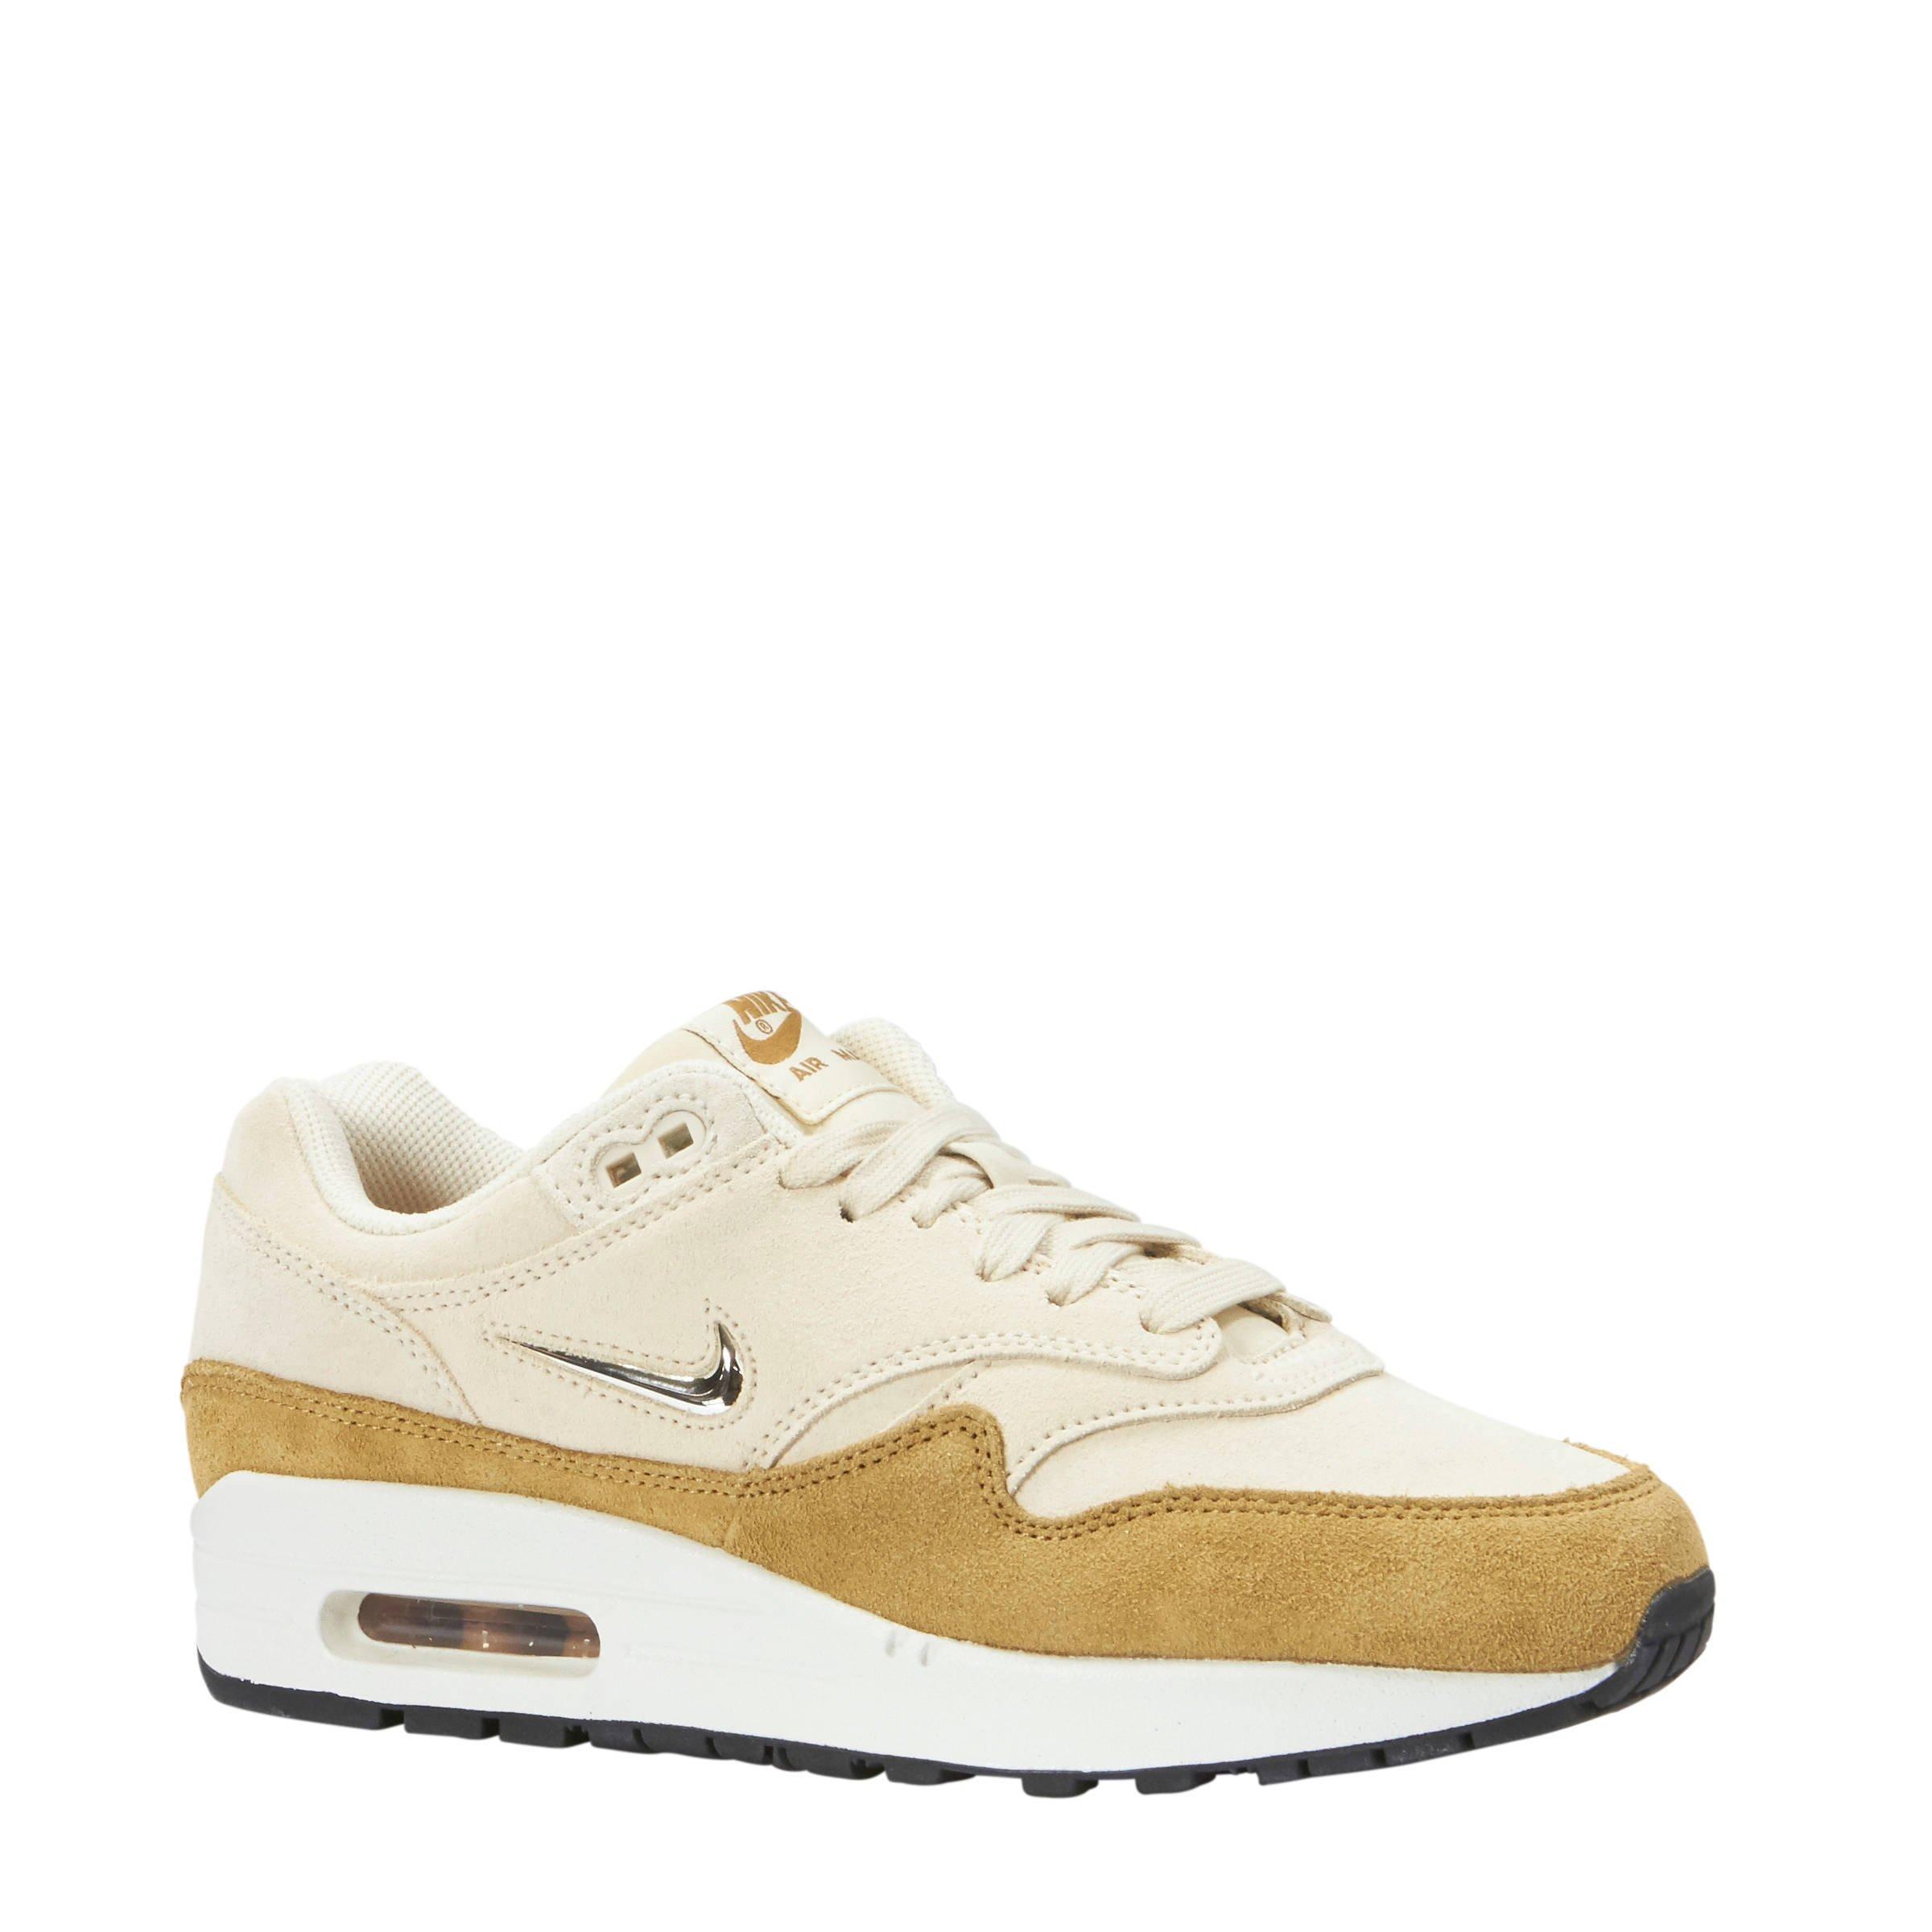 Beigeokergeel Zeqixhnows Wehkamp Sneakers Air Premium 1 Max Nike TlJFuc3K1